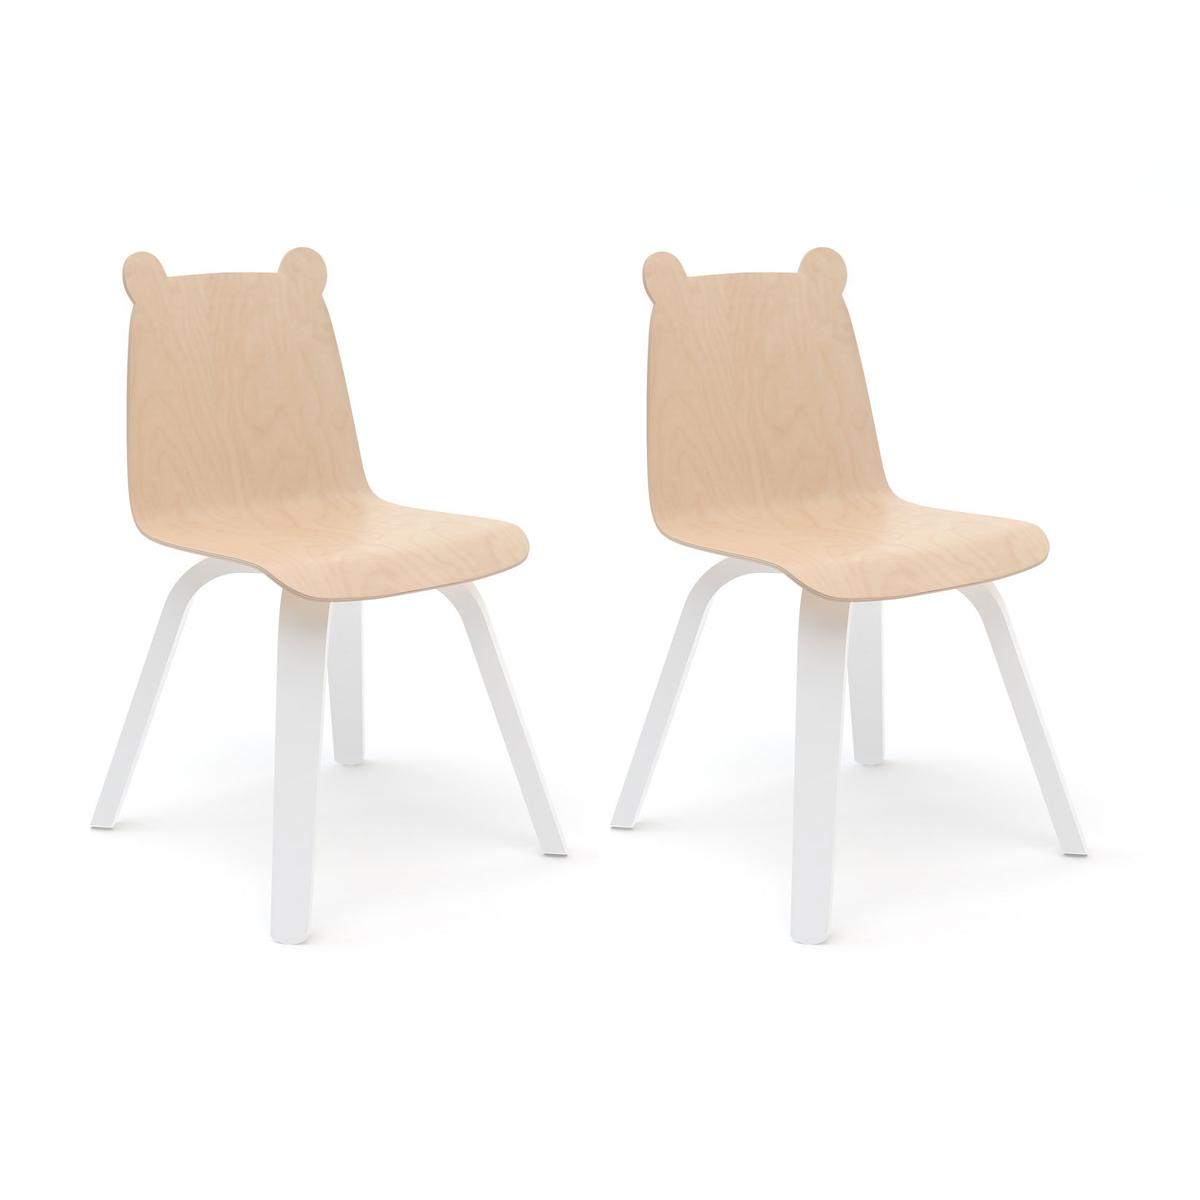 Table & Chaise Lot de 2 Chaises Play Ours - Bouleau